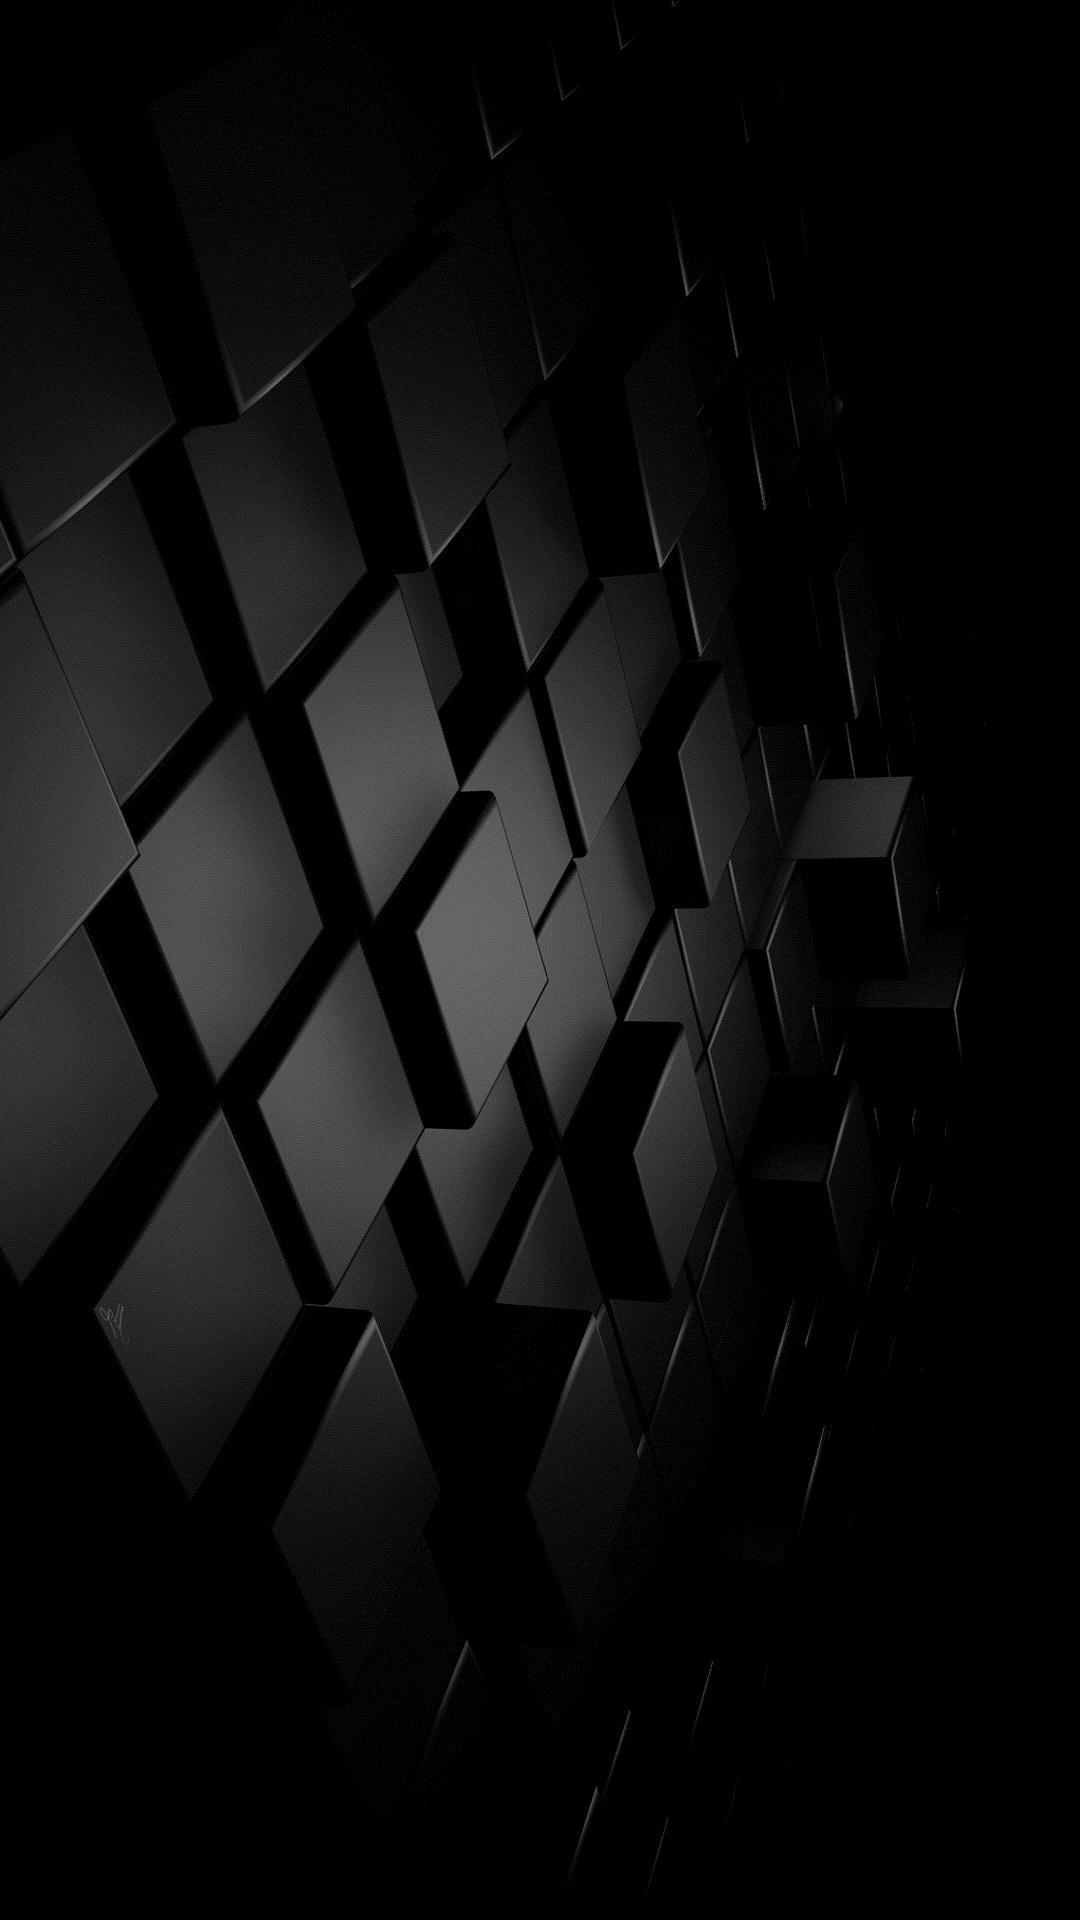 Black Wallpaper Hd 1080p For Mobile Wallpaper 1080x1920 Wallpaper Teahub Io